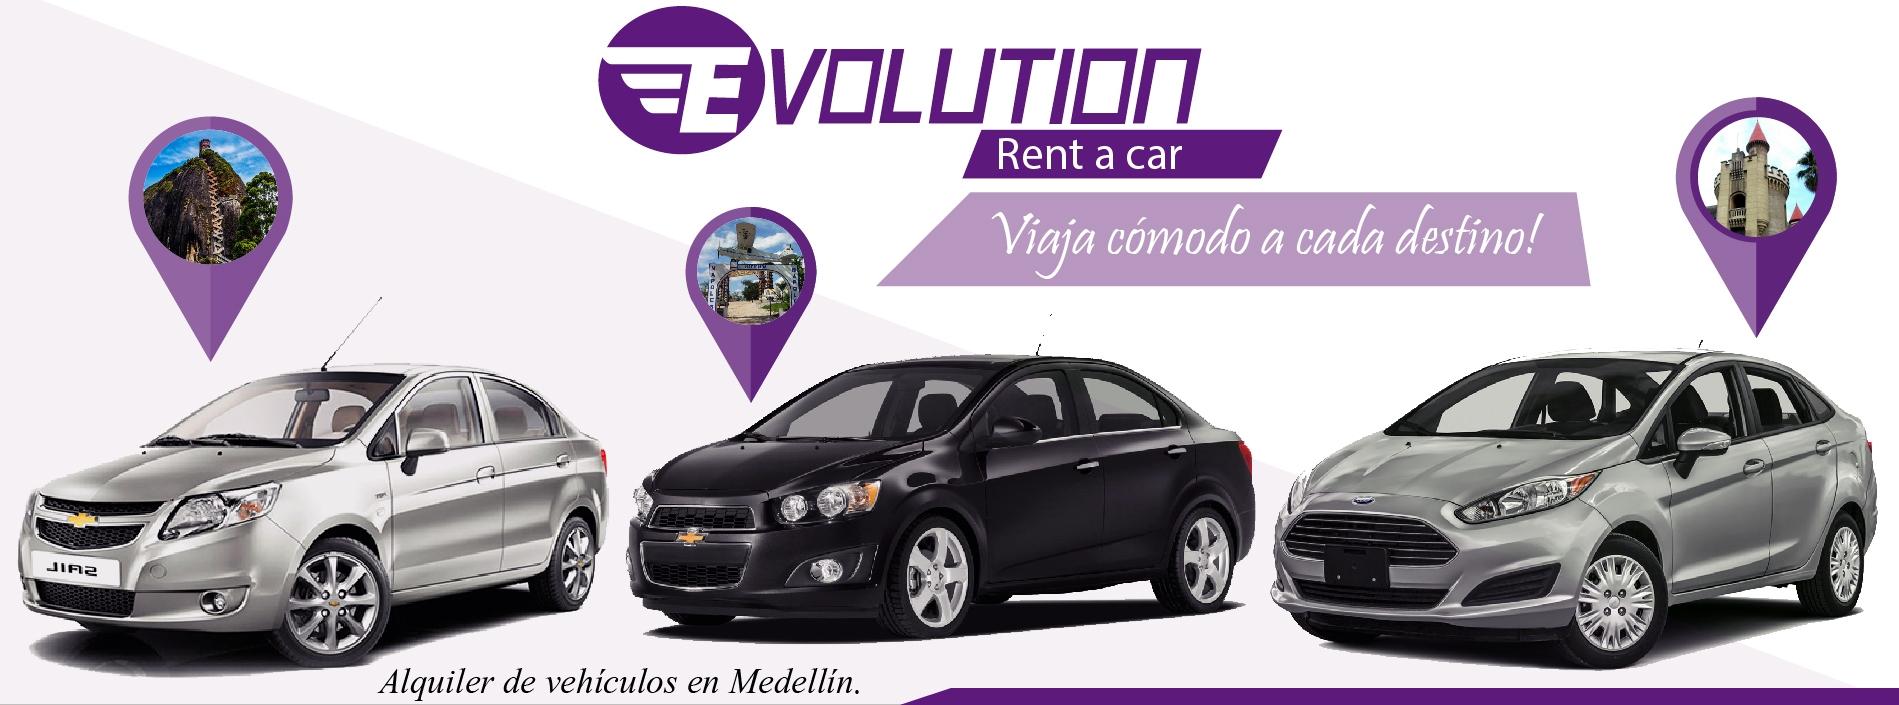 Enterprise Rent A Car Medellin